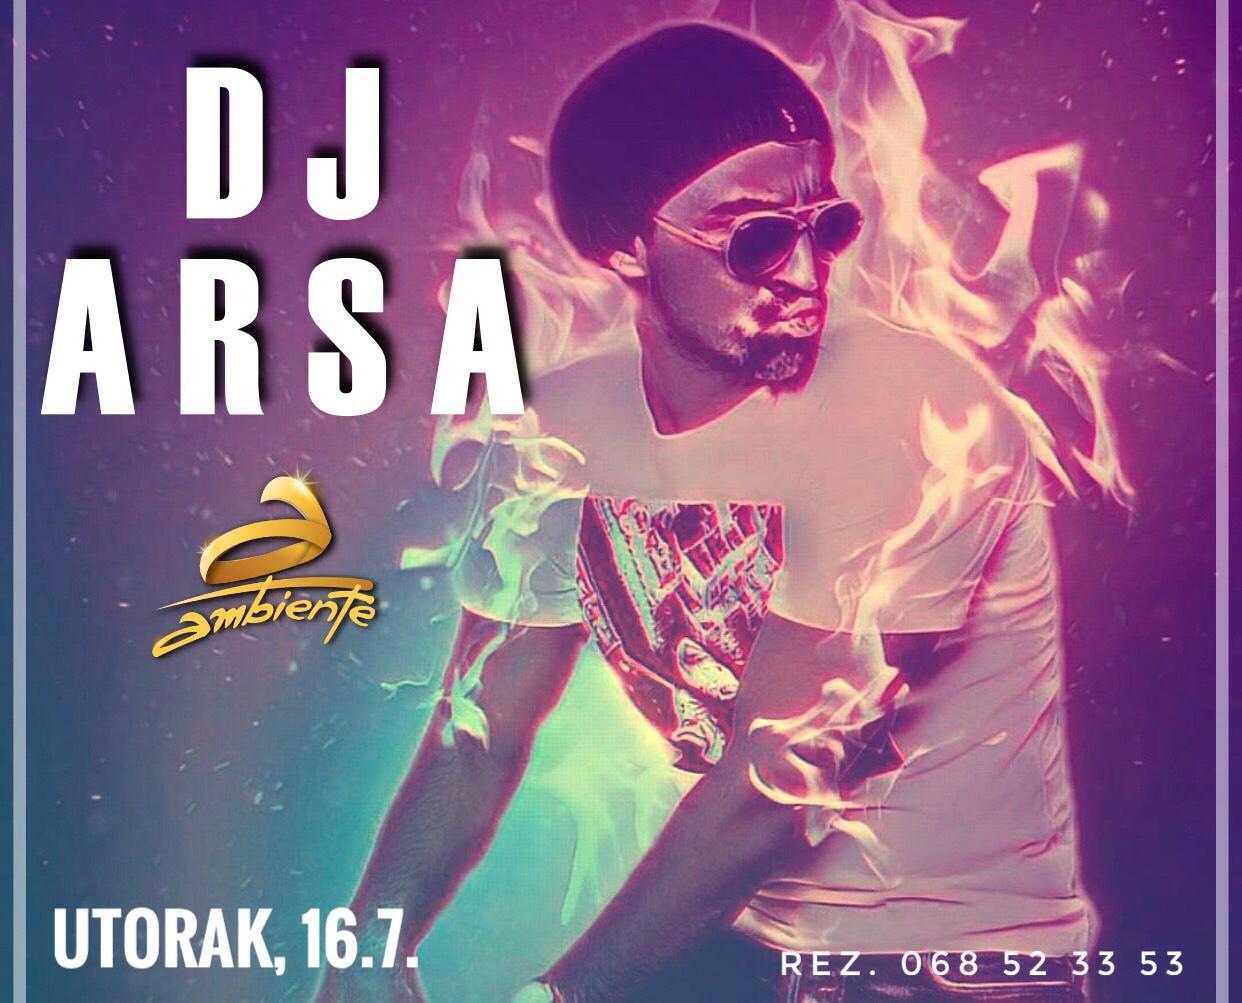 DJ Arsa